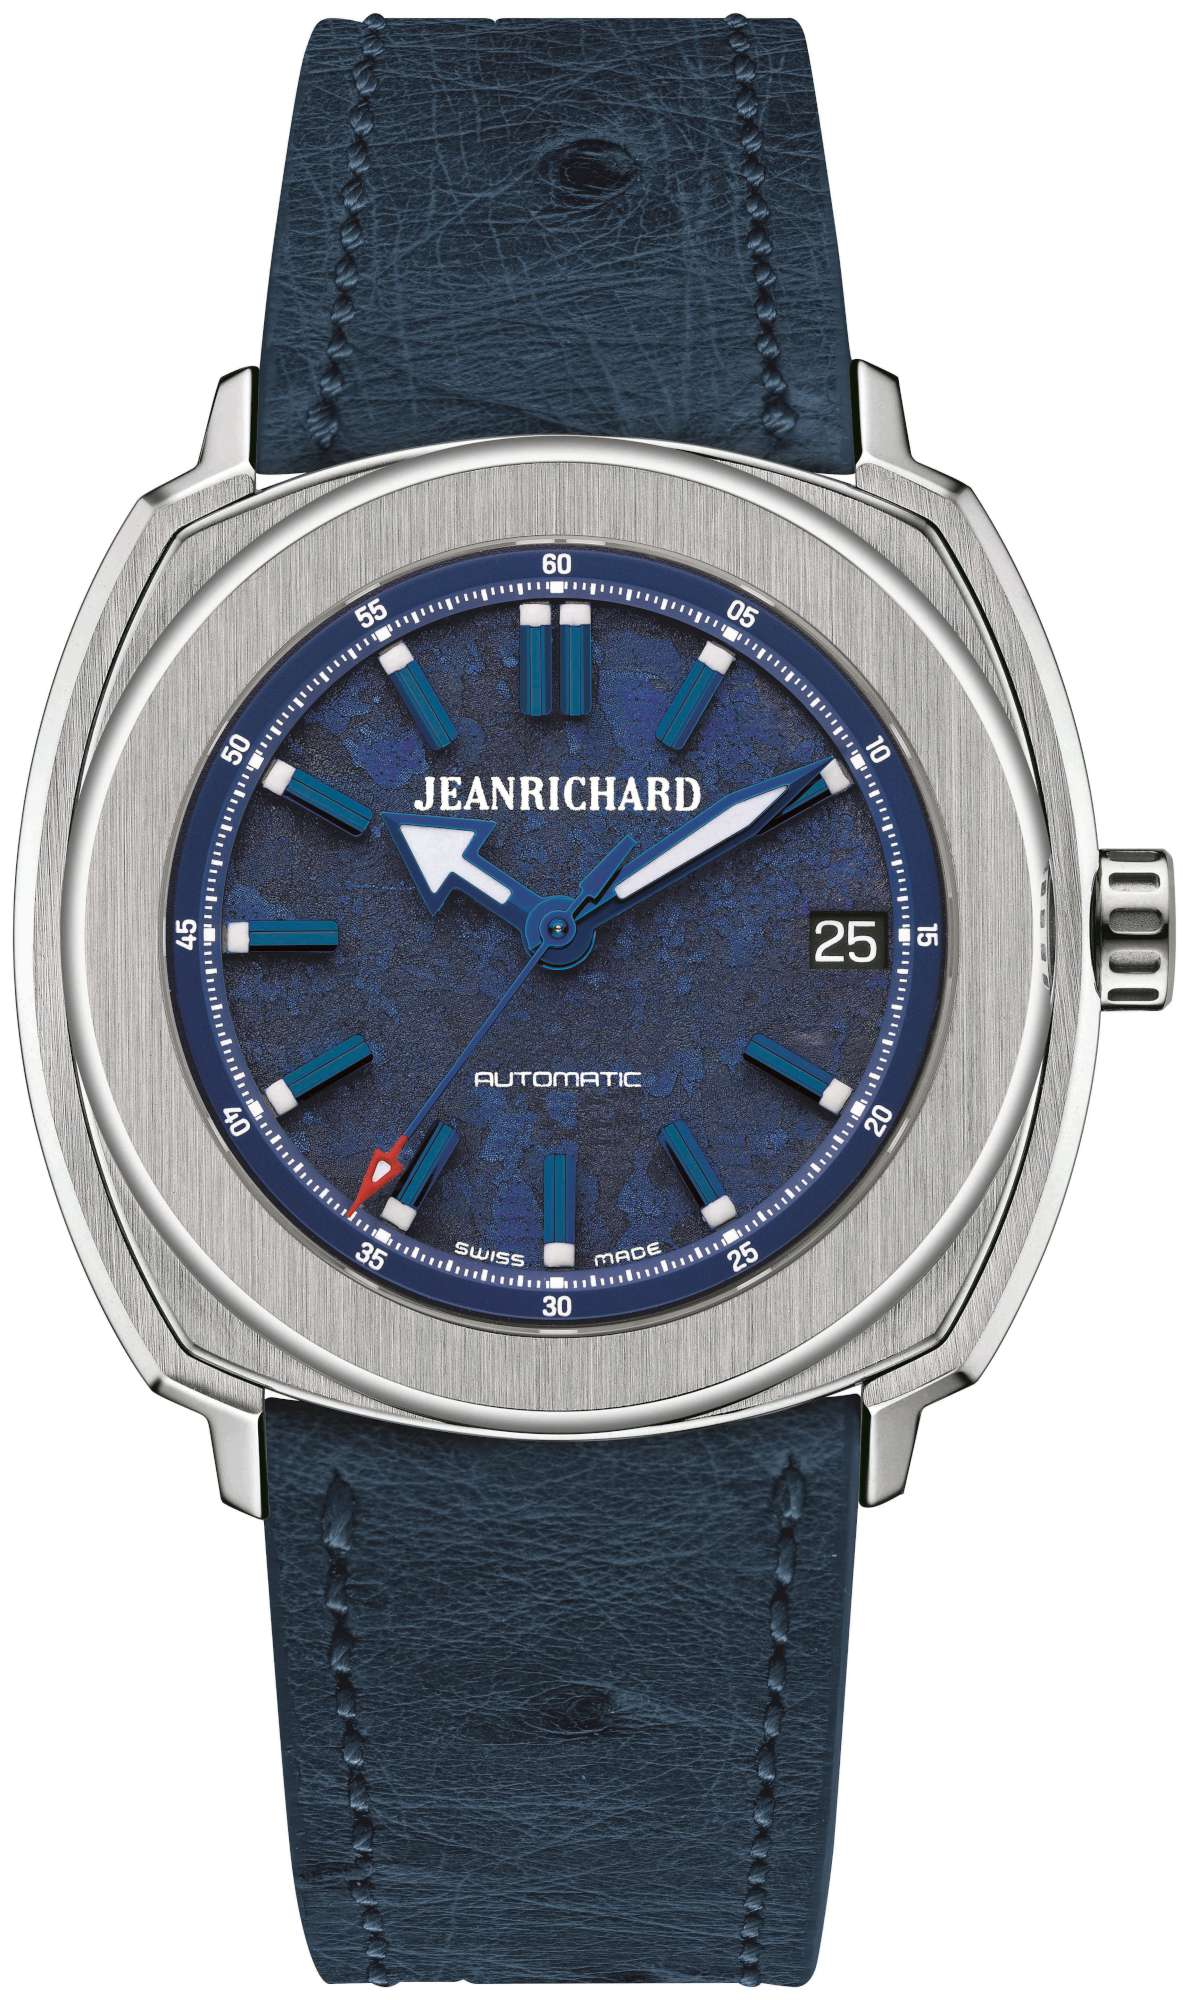 Jeanrichard Terrascope Reference 60510-11-401-QB4A, €2,200